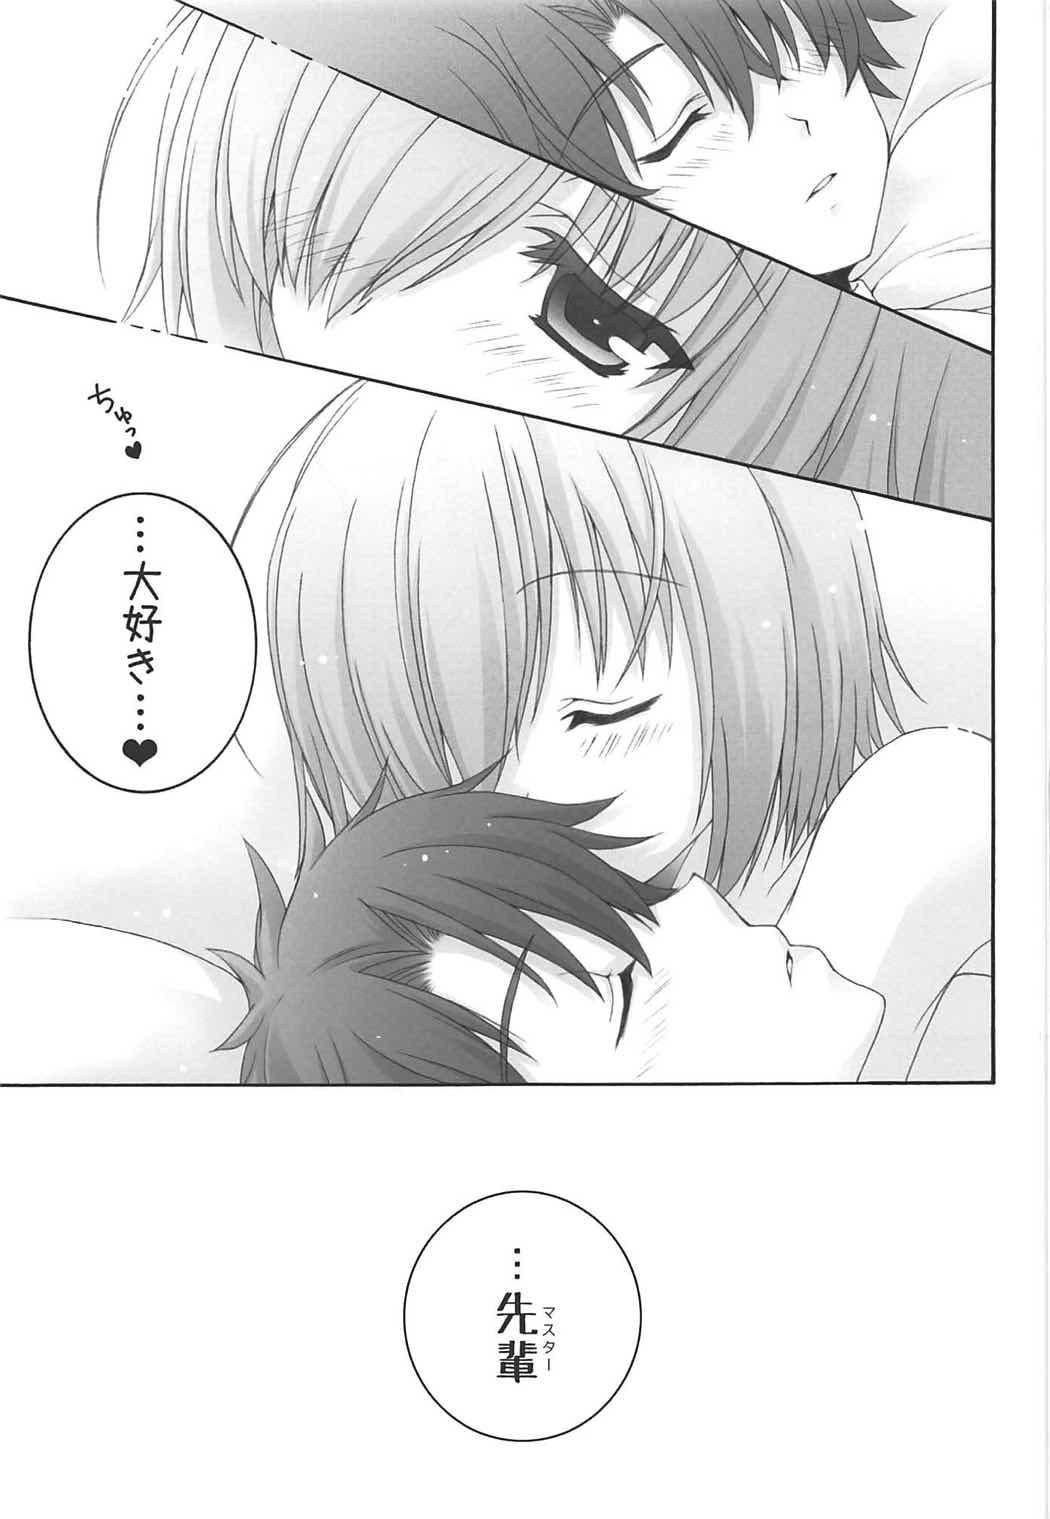 (COMIC1☆11) [Pyonpyororin (Akoko.)] - 1 day ago - (Fate/Grand Order) 23